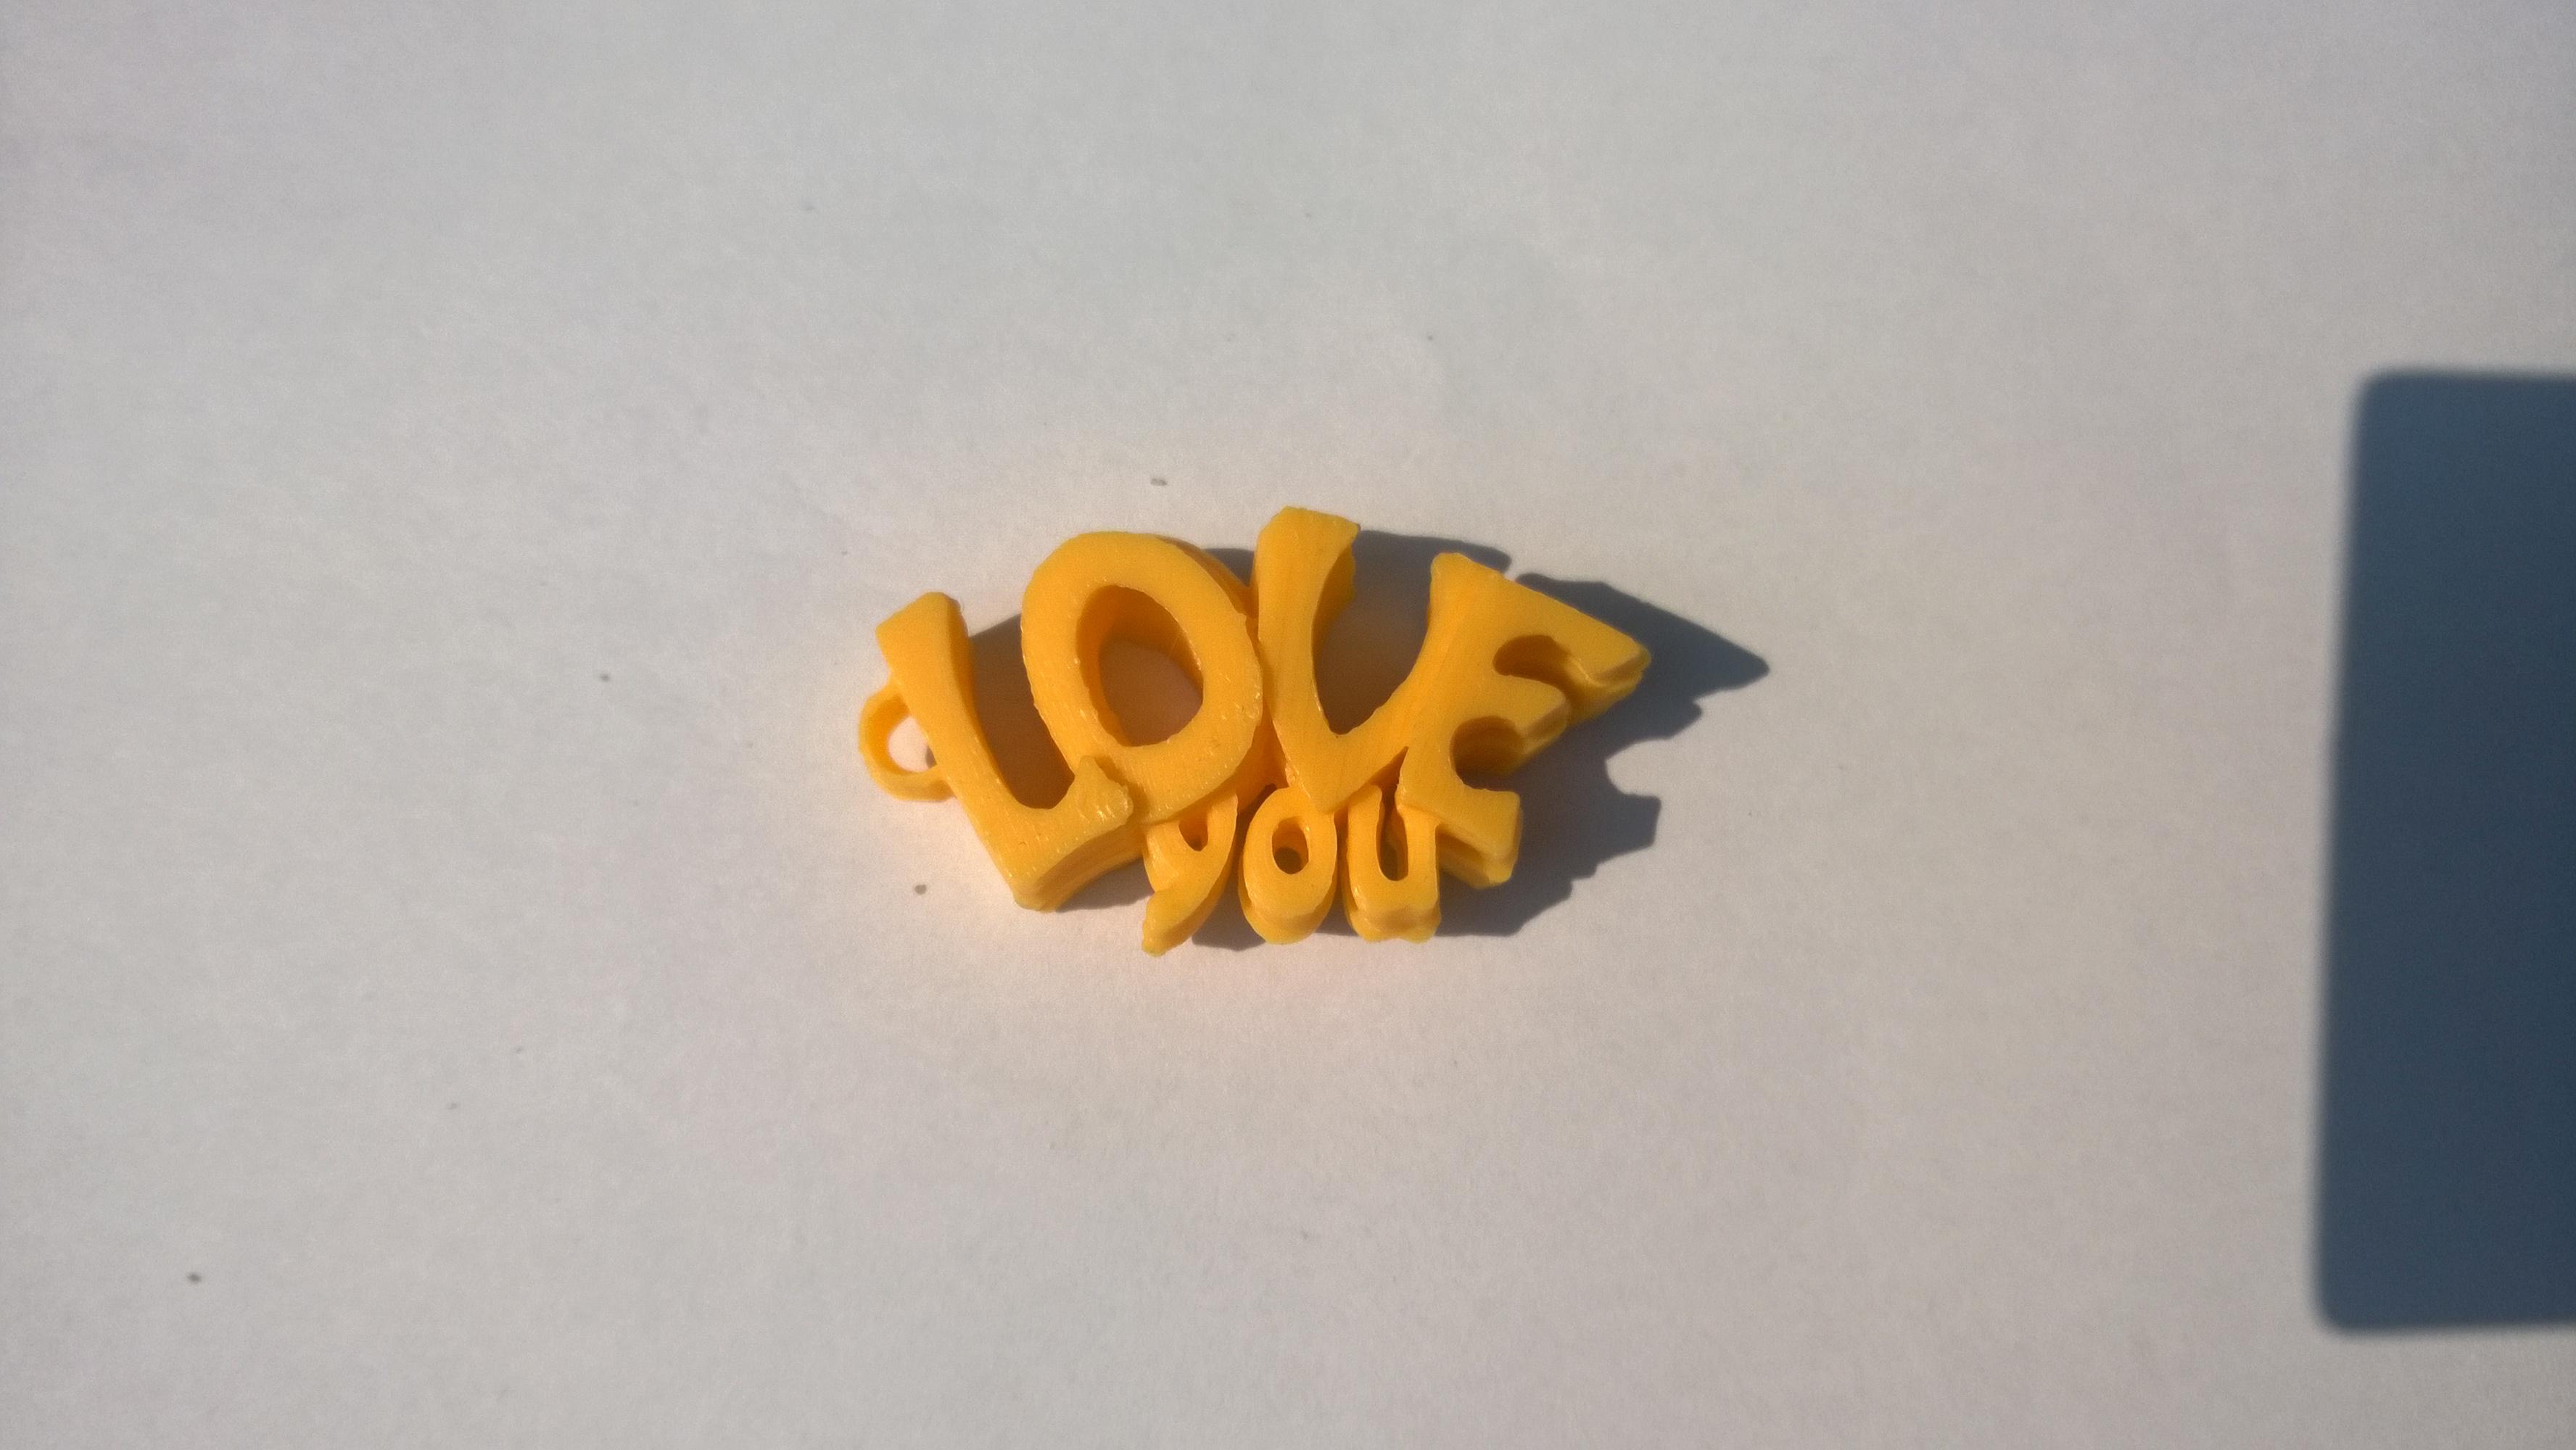 LOVE3D打印模型,LOVE3D模型下载,3D打印LOVE模型下载,LOVE3D模型,LOVESTL格式文件,LOVE3D打印模型免费下载,3D打印模型库